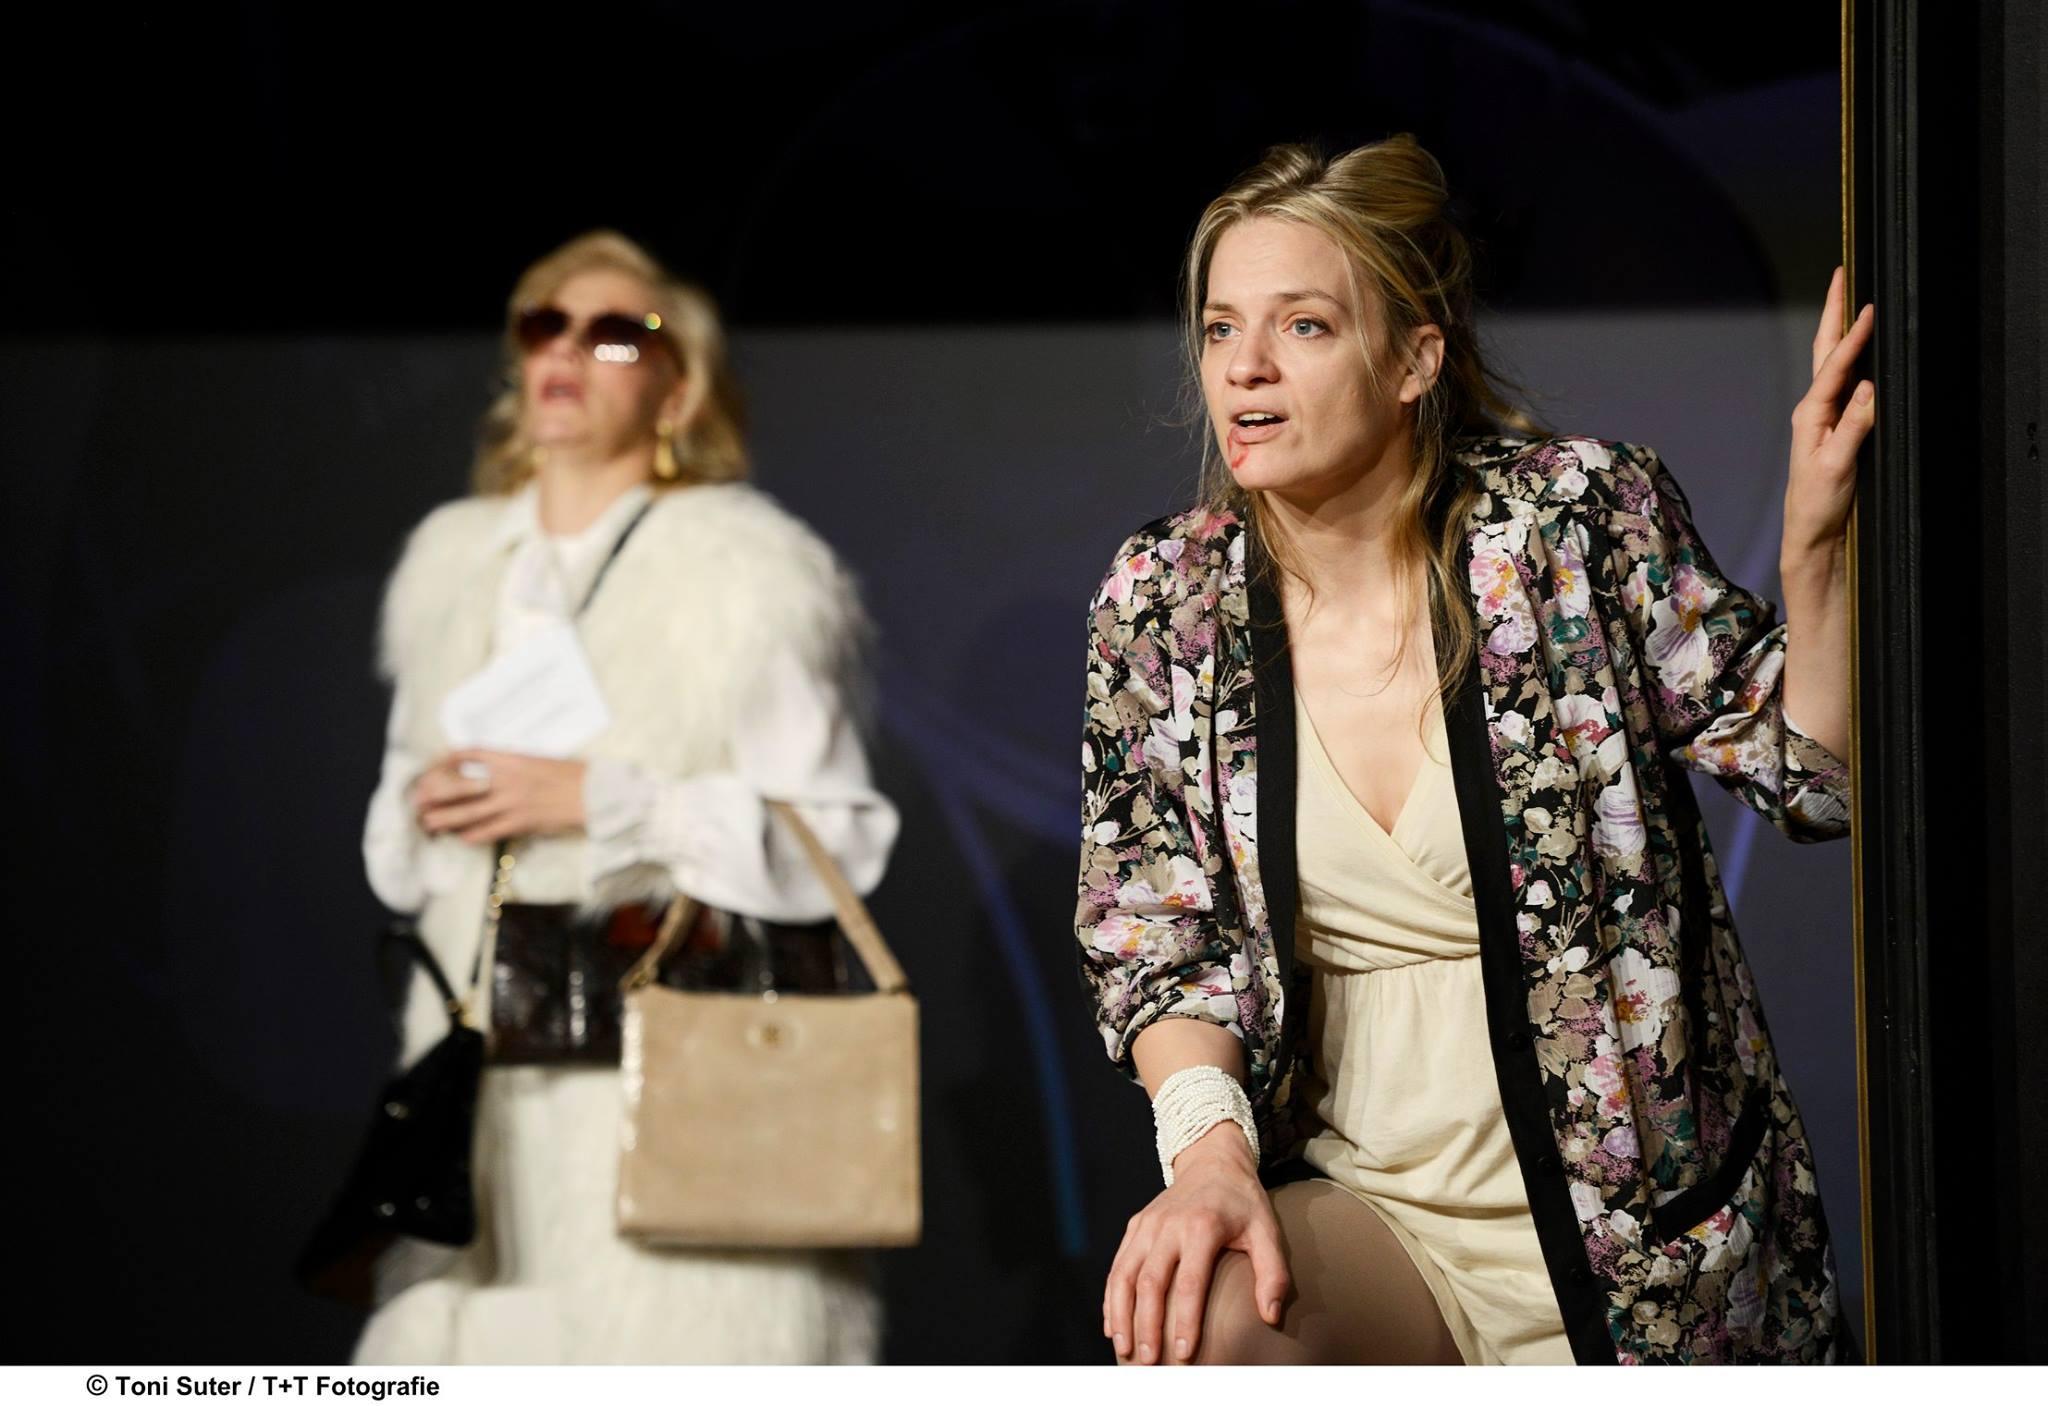 Endstation Sehnsucht, Regie: Barbara-David Brüesch (2016)